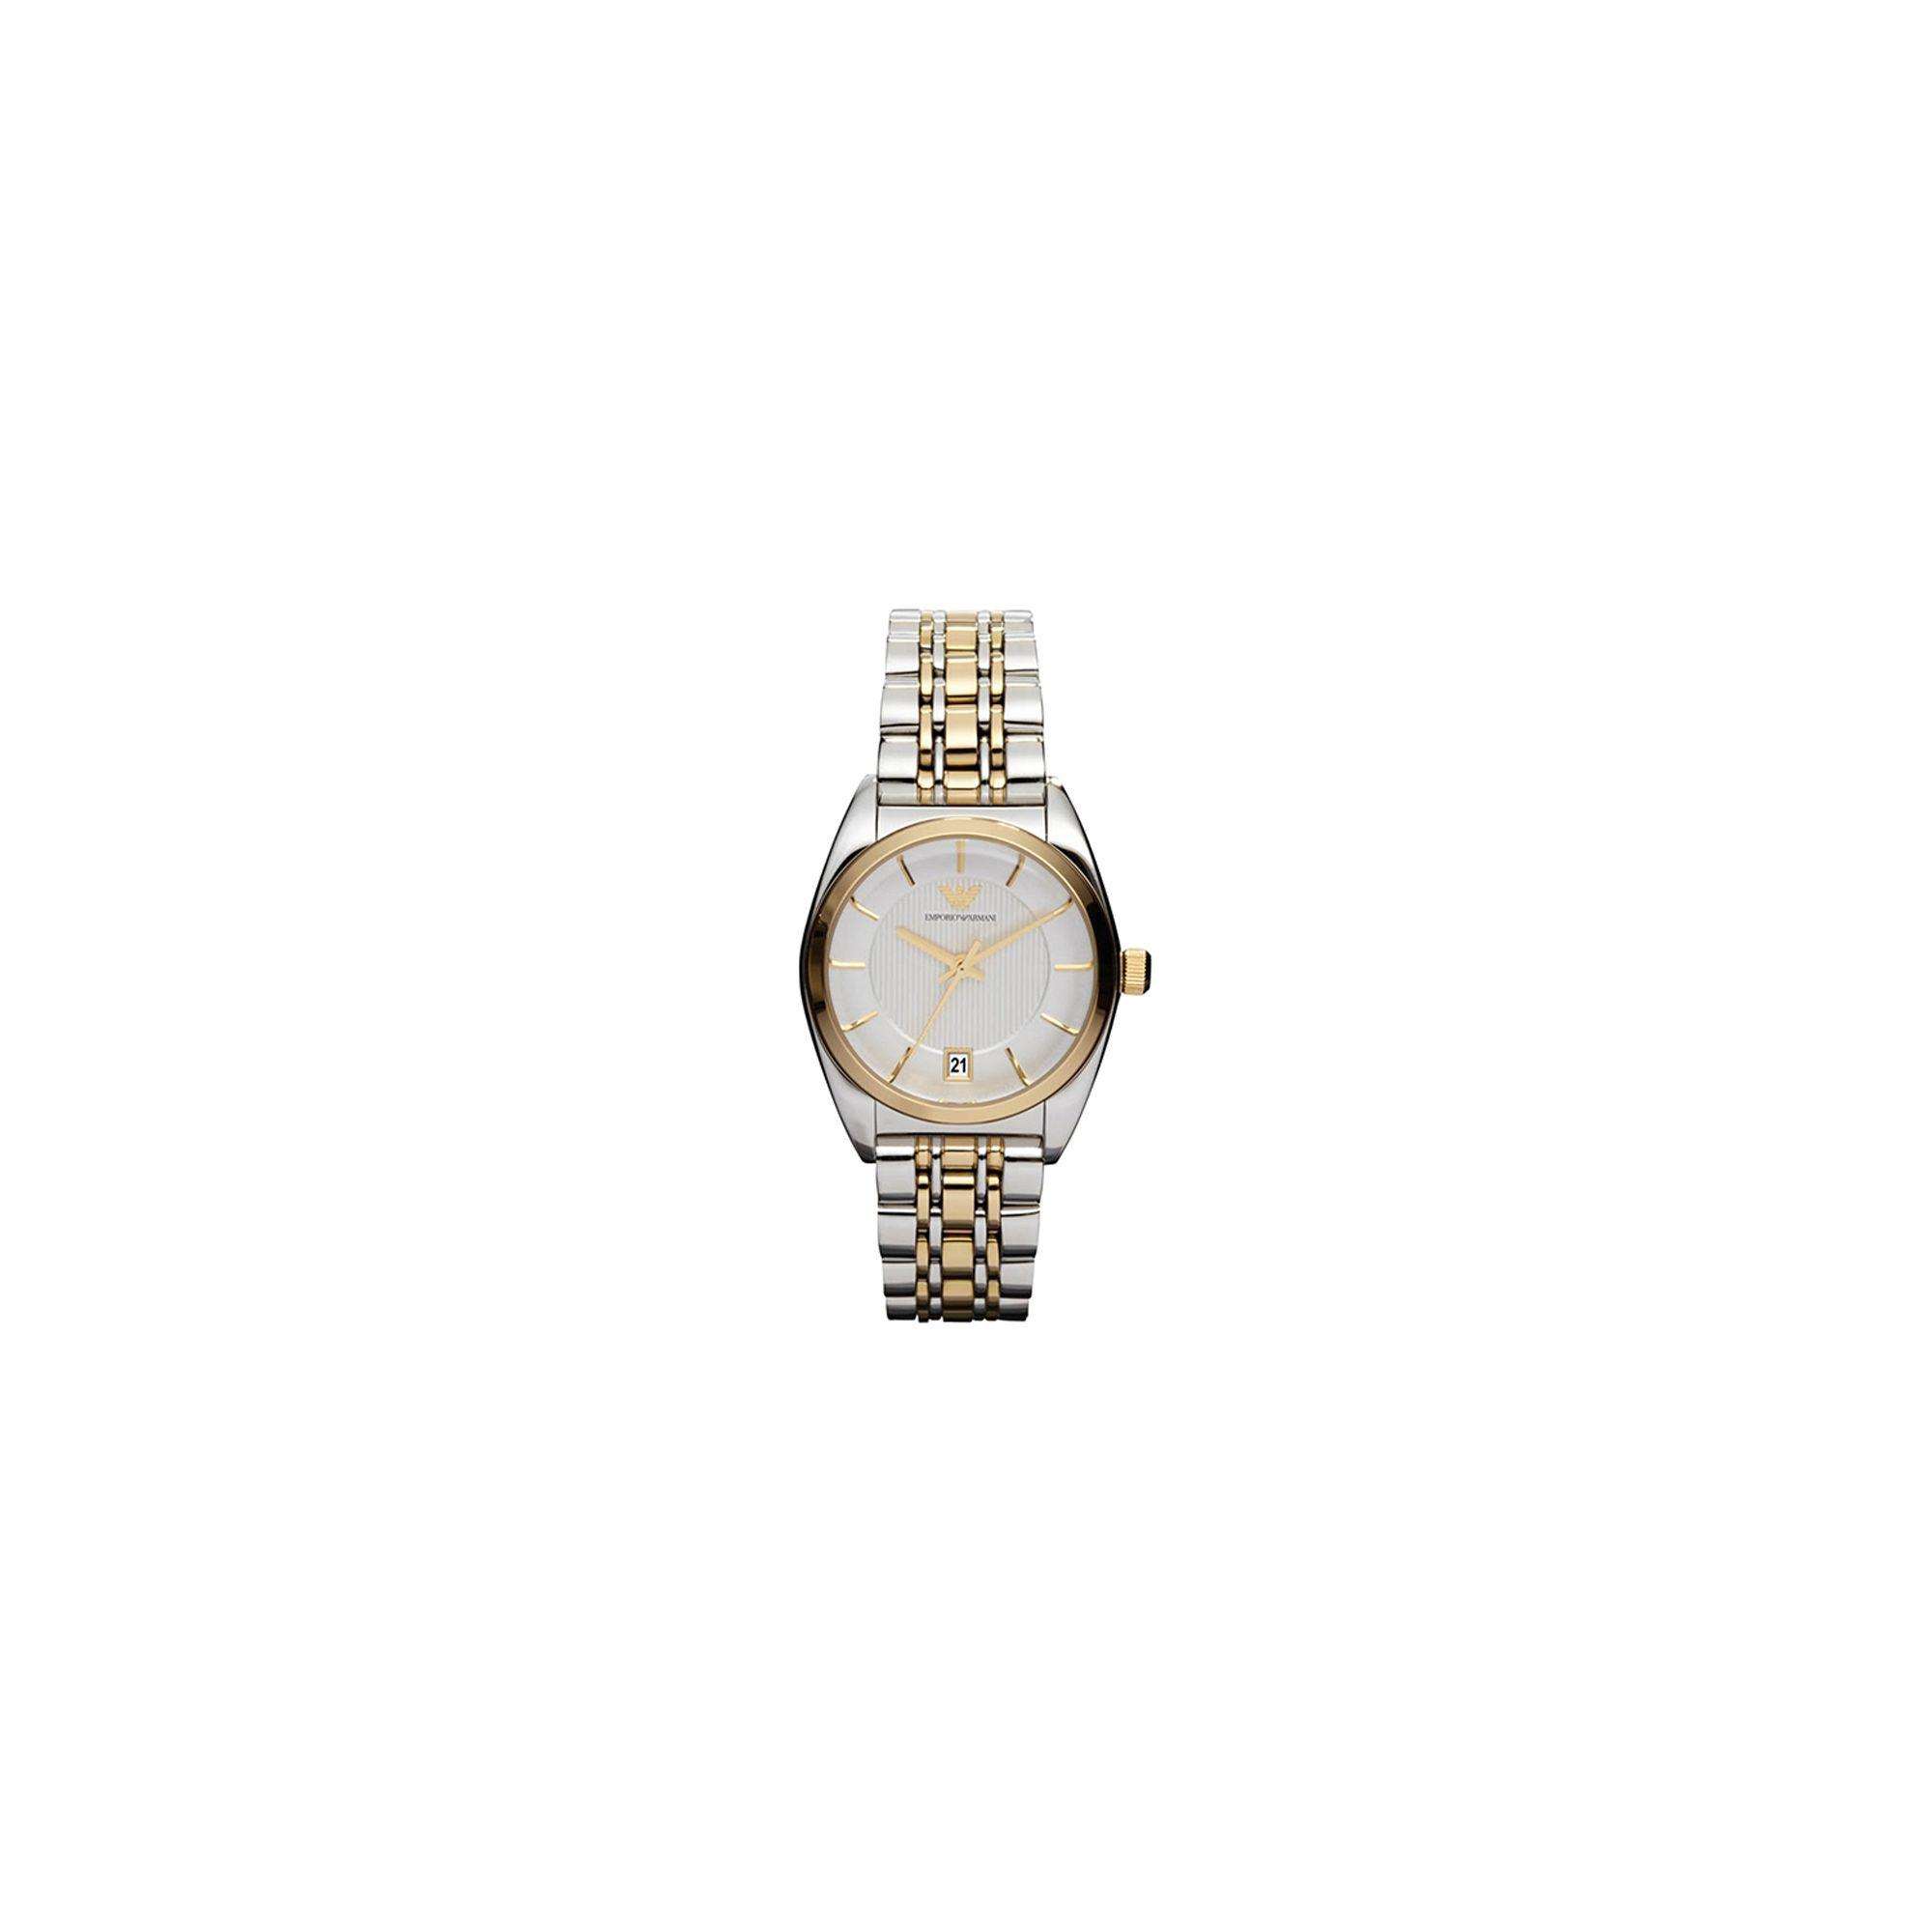 Emporio Armani Ladies Bracelet Watch AR0380 at Tesco Direct